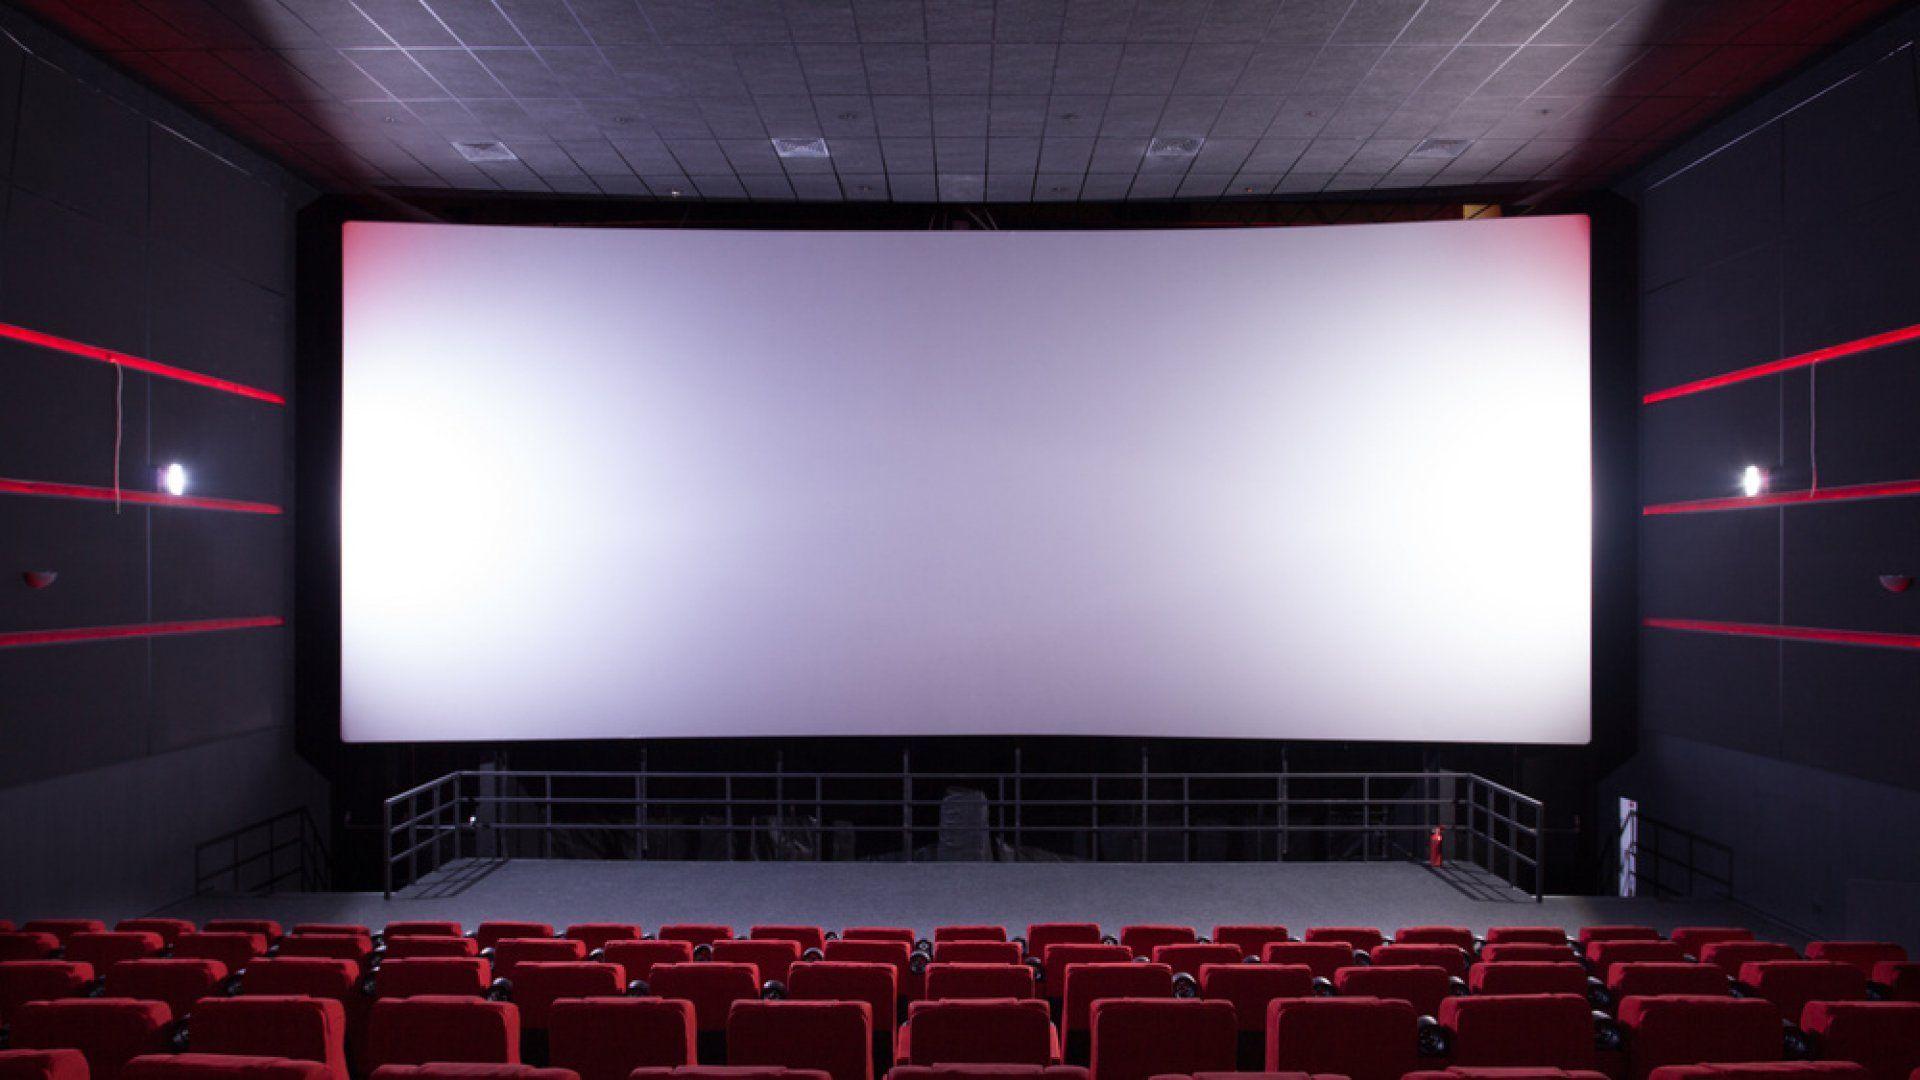 Movie Theater good wallpaper hd